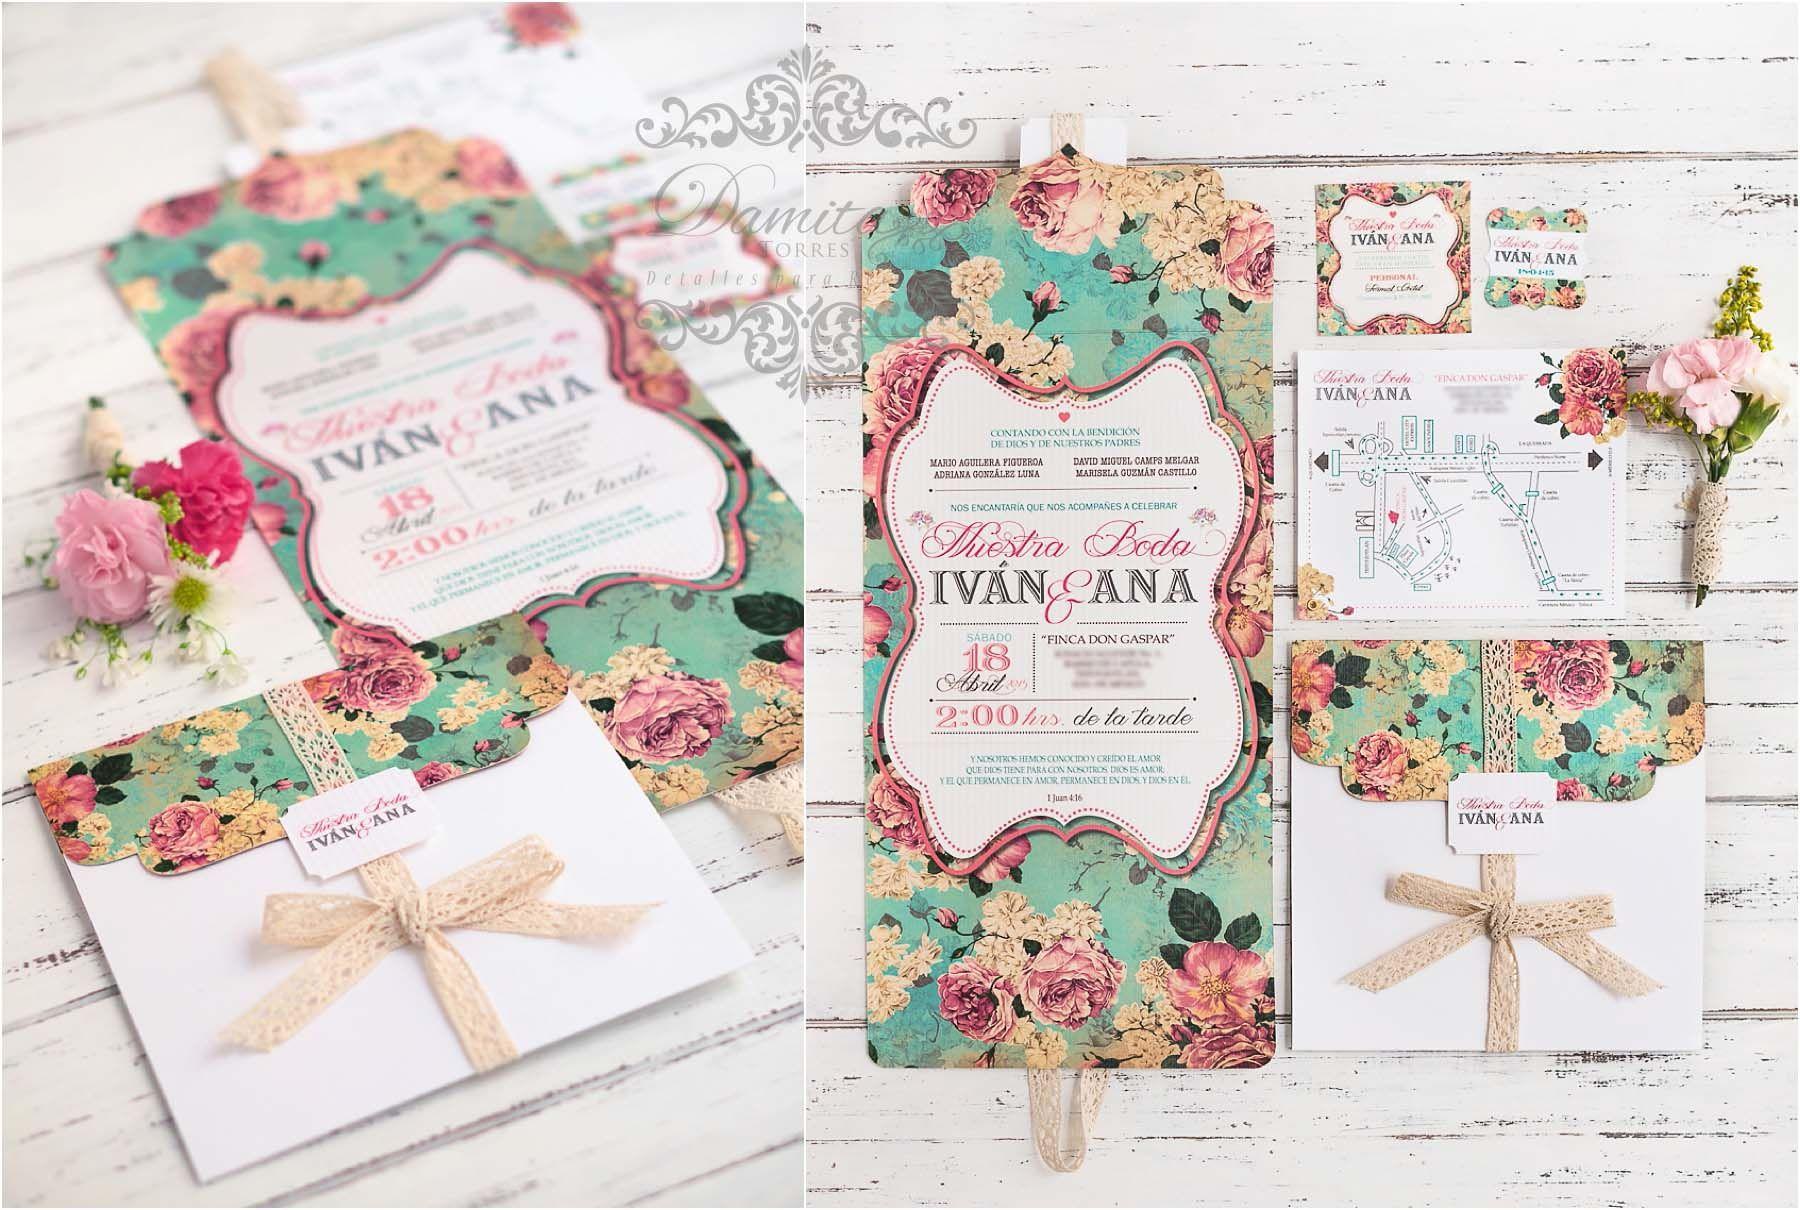 Invitacion boda invitation wedding turquesa aqua shabby chic coral tarjetas 15 - Boda shabby chic ...